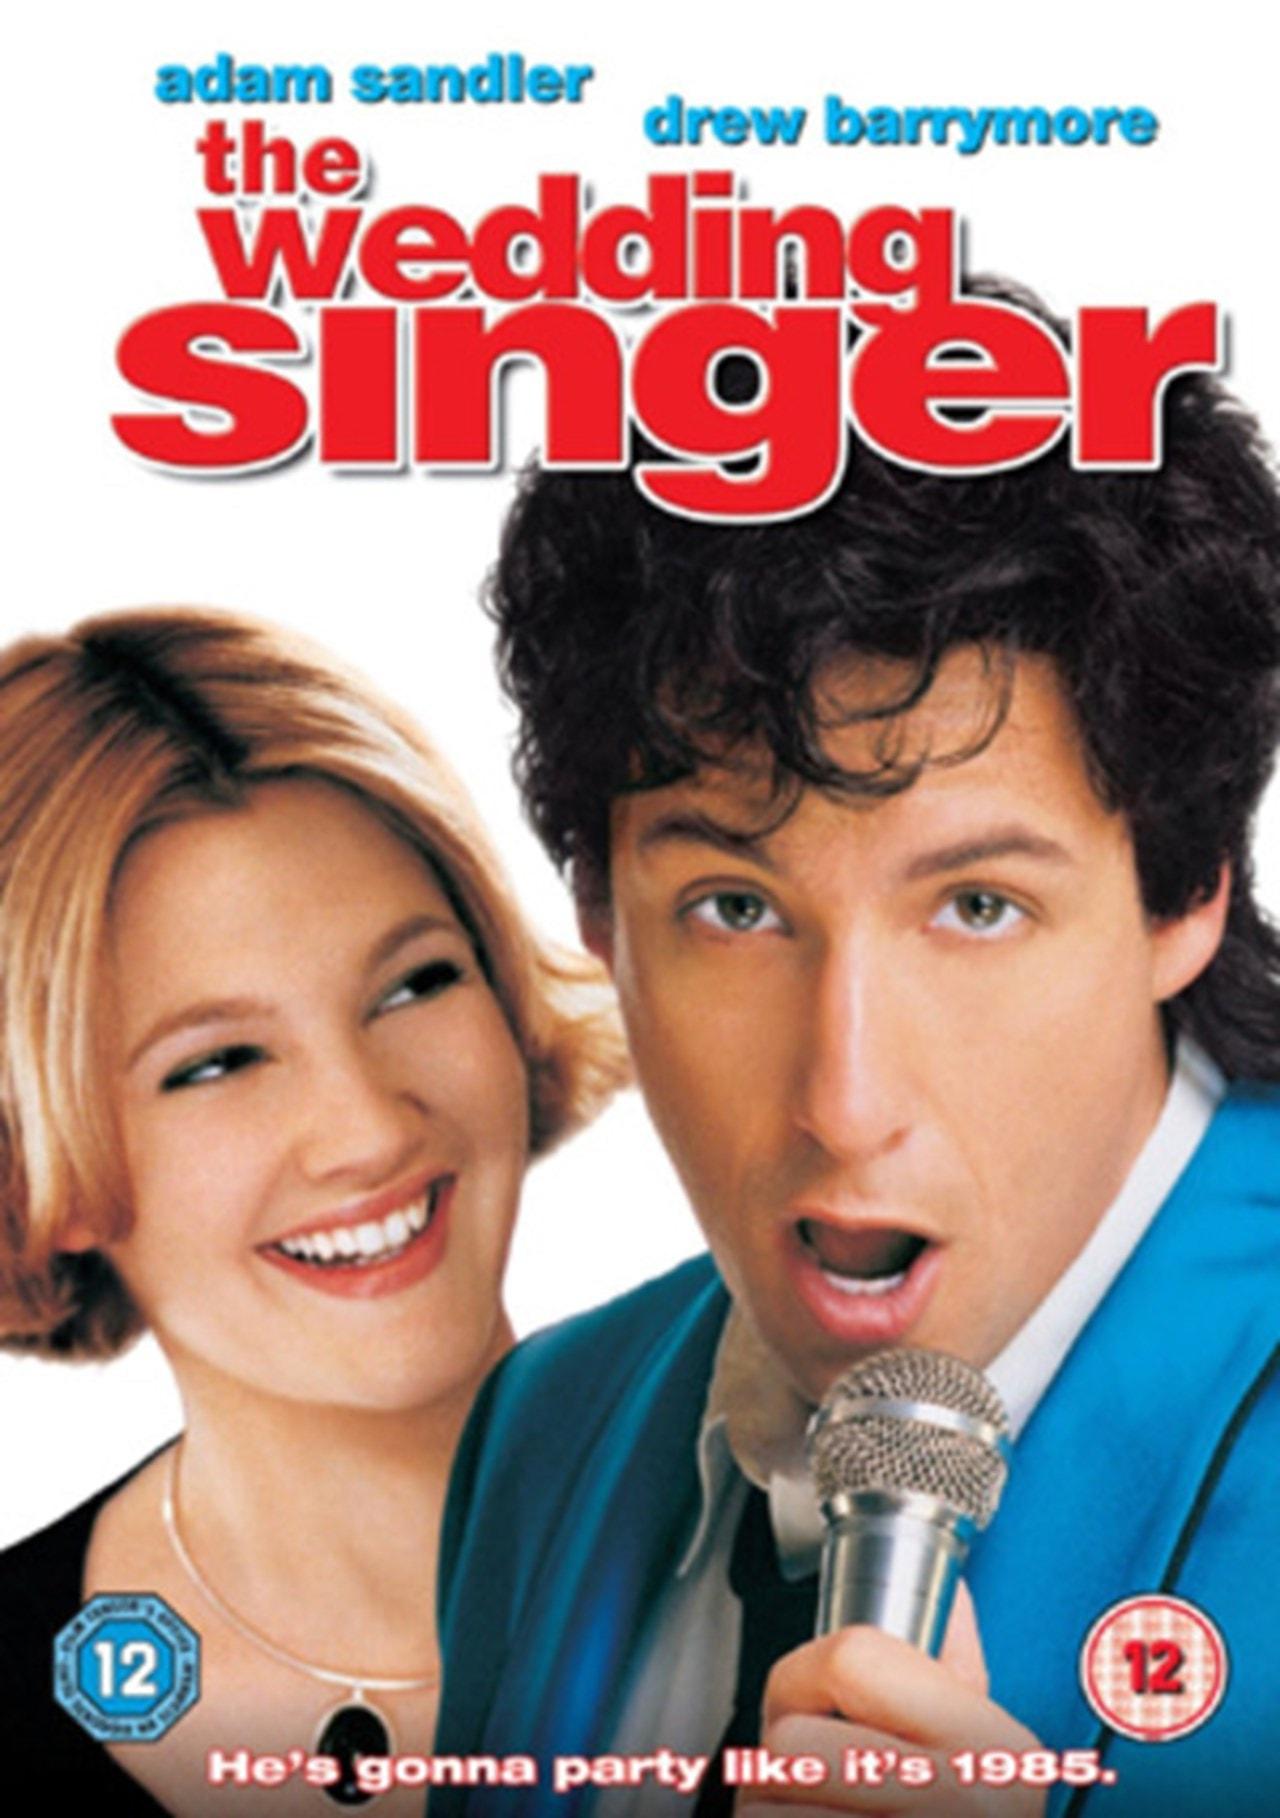 The Wedding Singer - 1